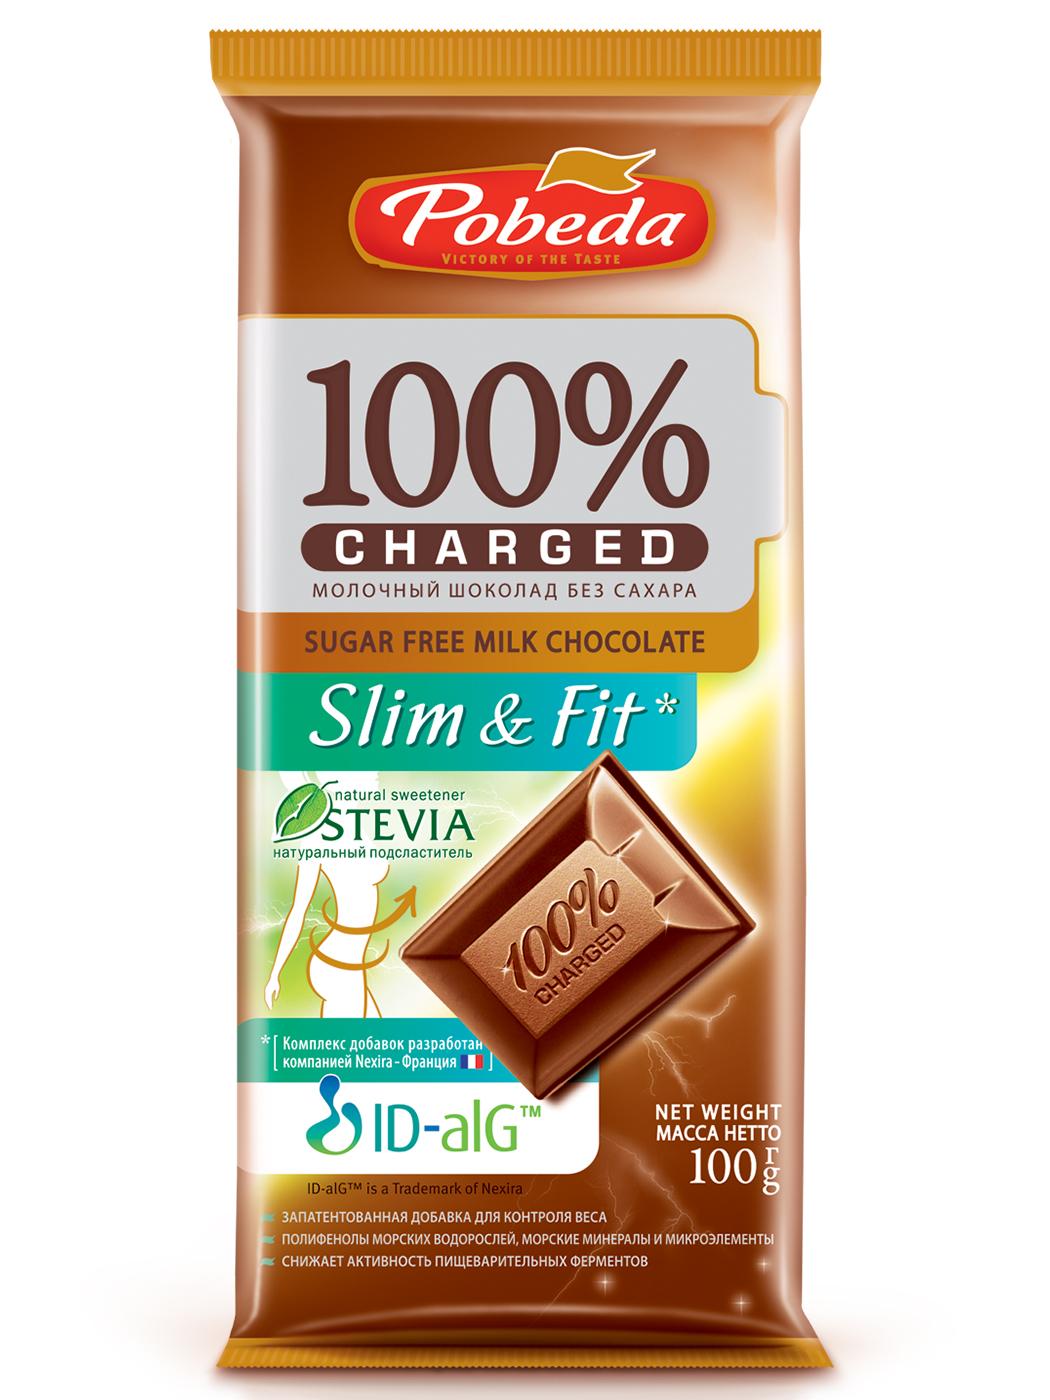 Шоколад молочный Победа Вкуса без добавления сахара чаржед слим энд фит